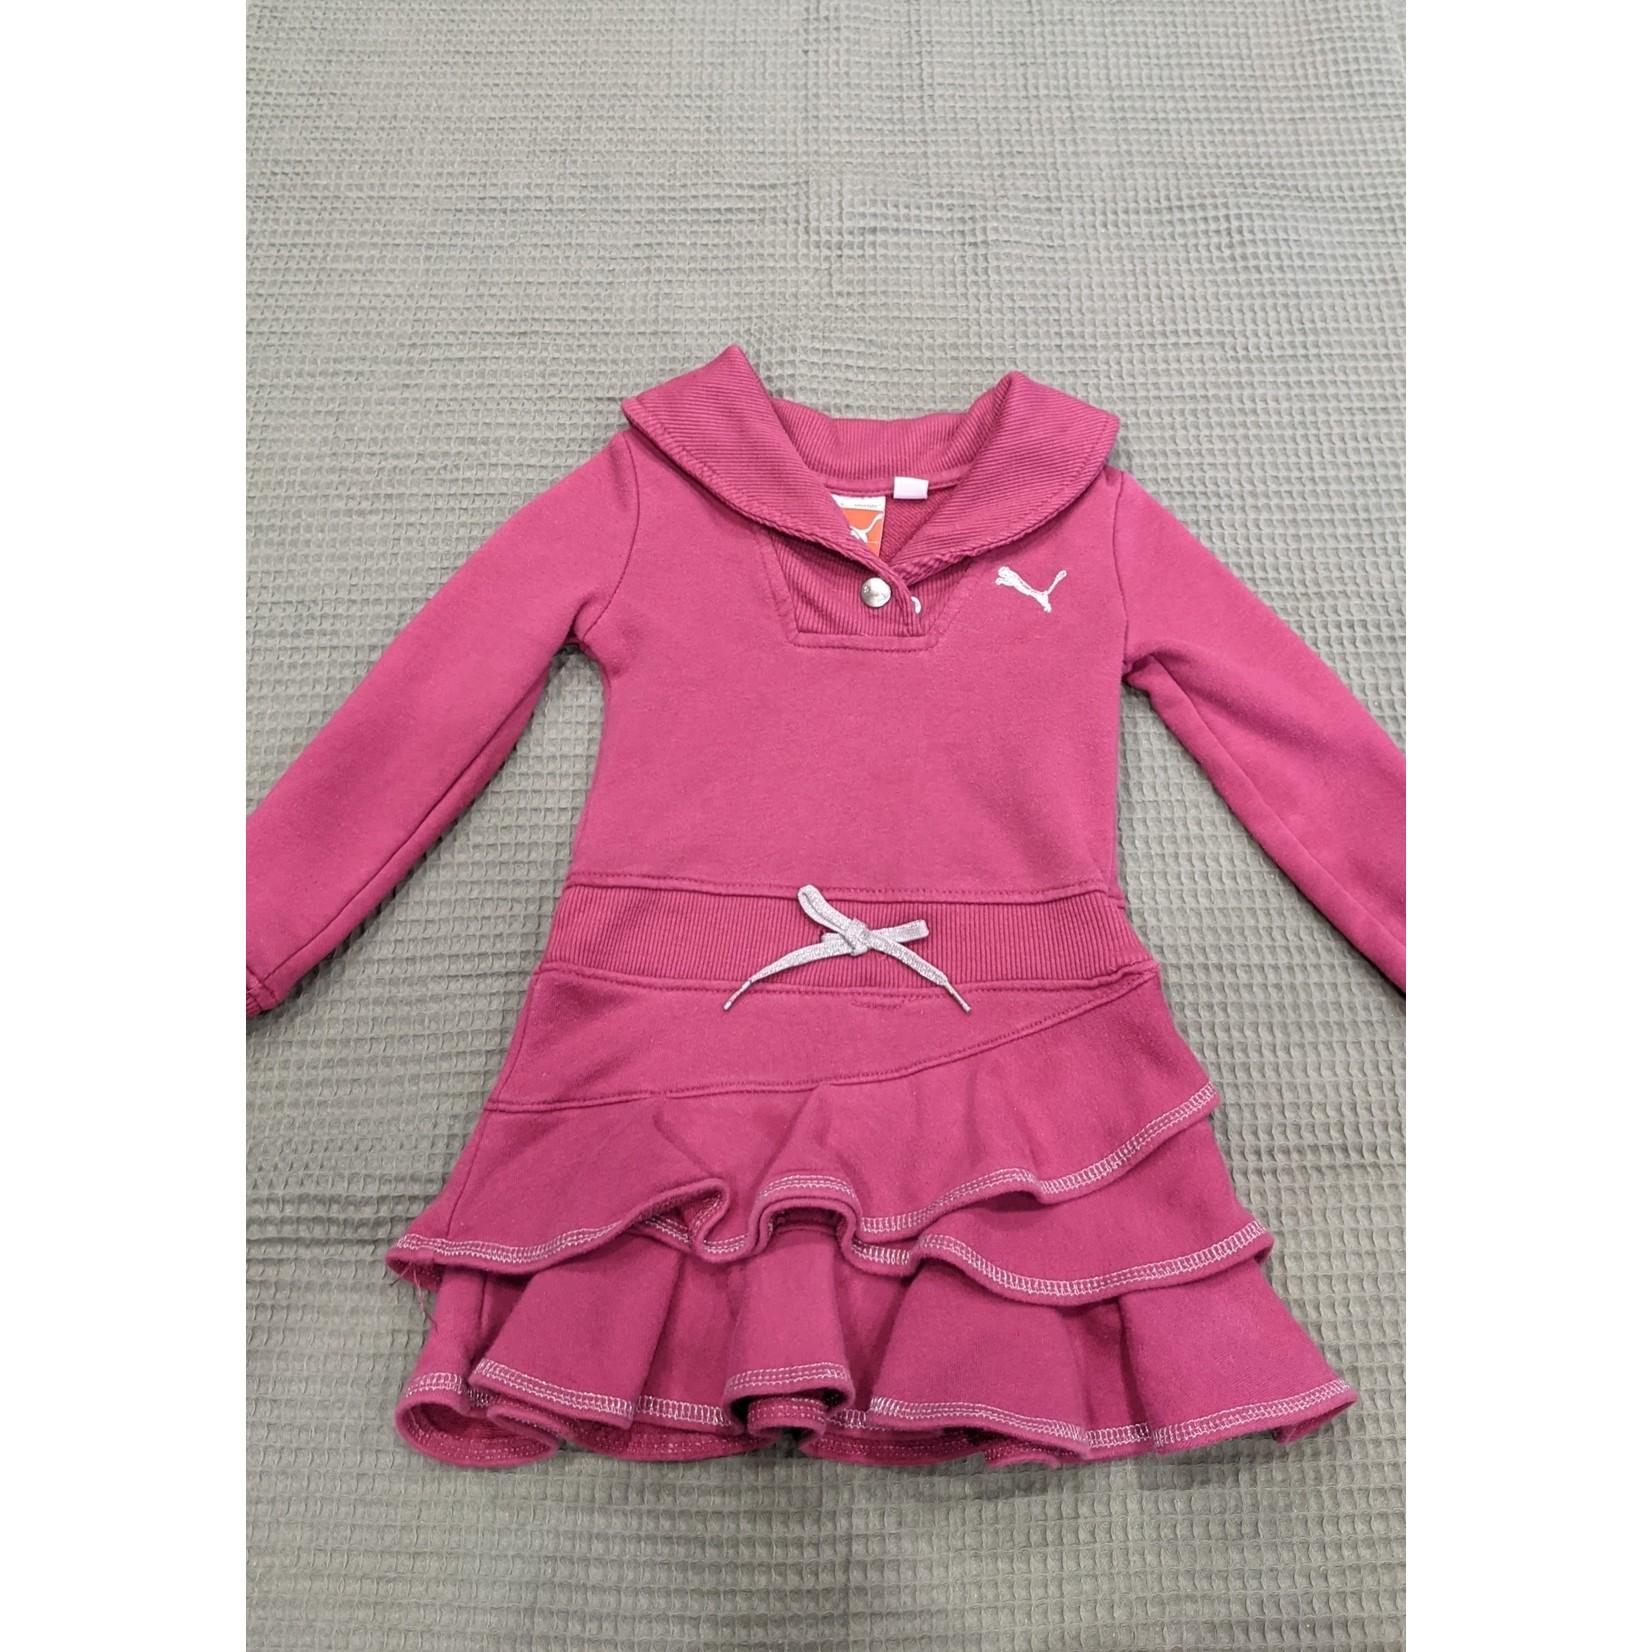 # 60 Robe rose Puma